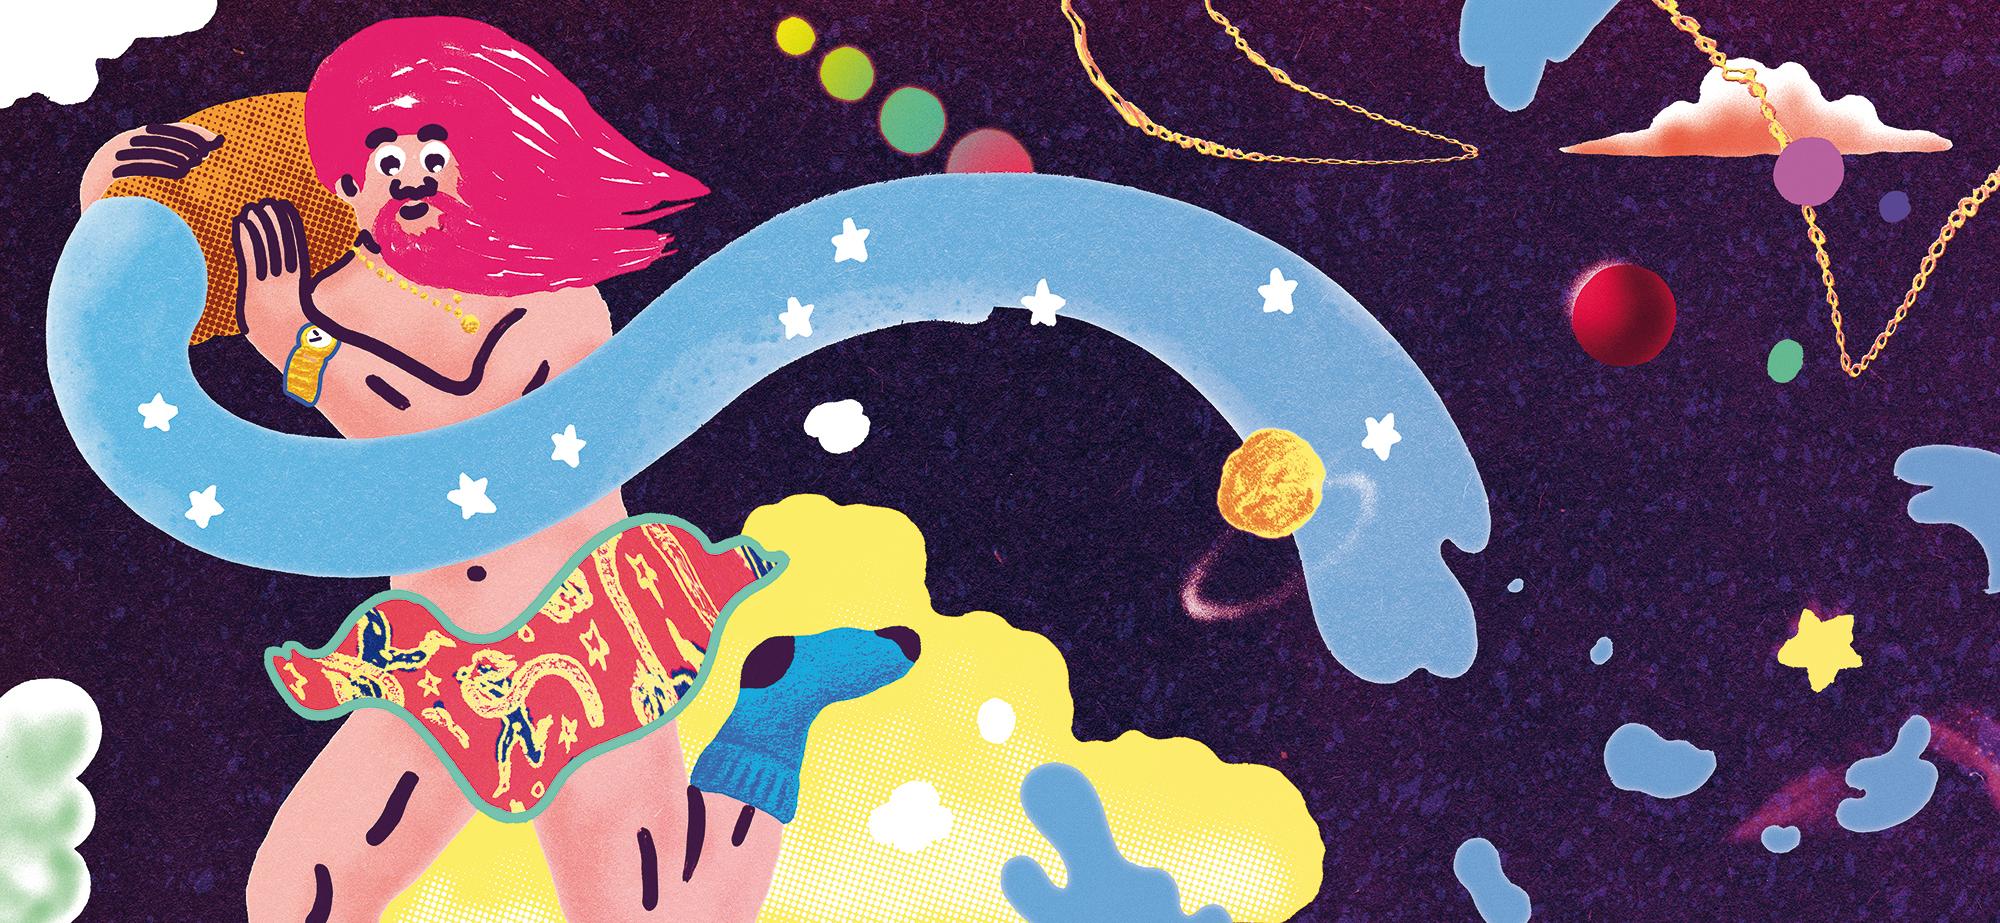 Elle Horoscopes Elle Horoscopes By Sac Magique Agent Pekka